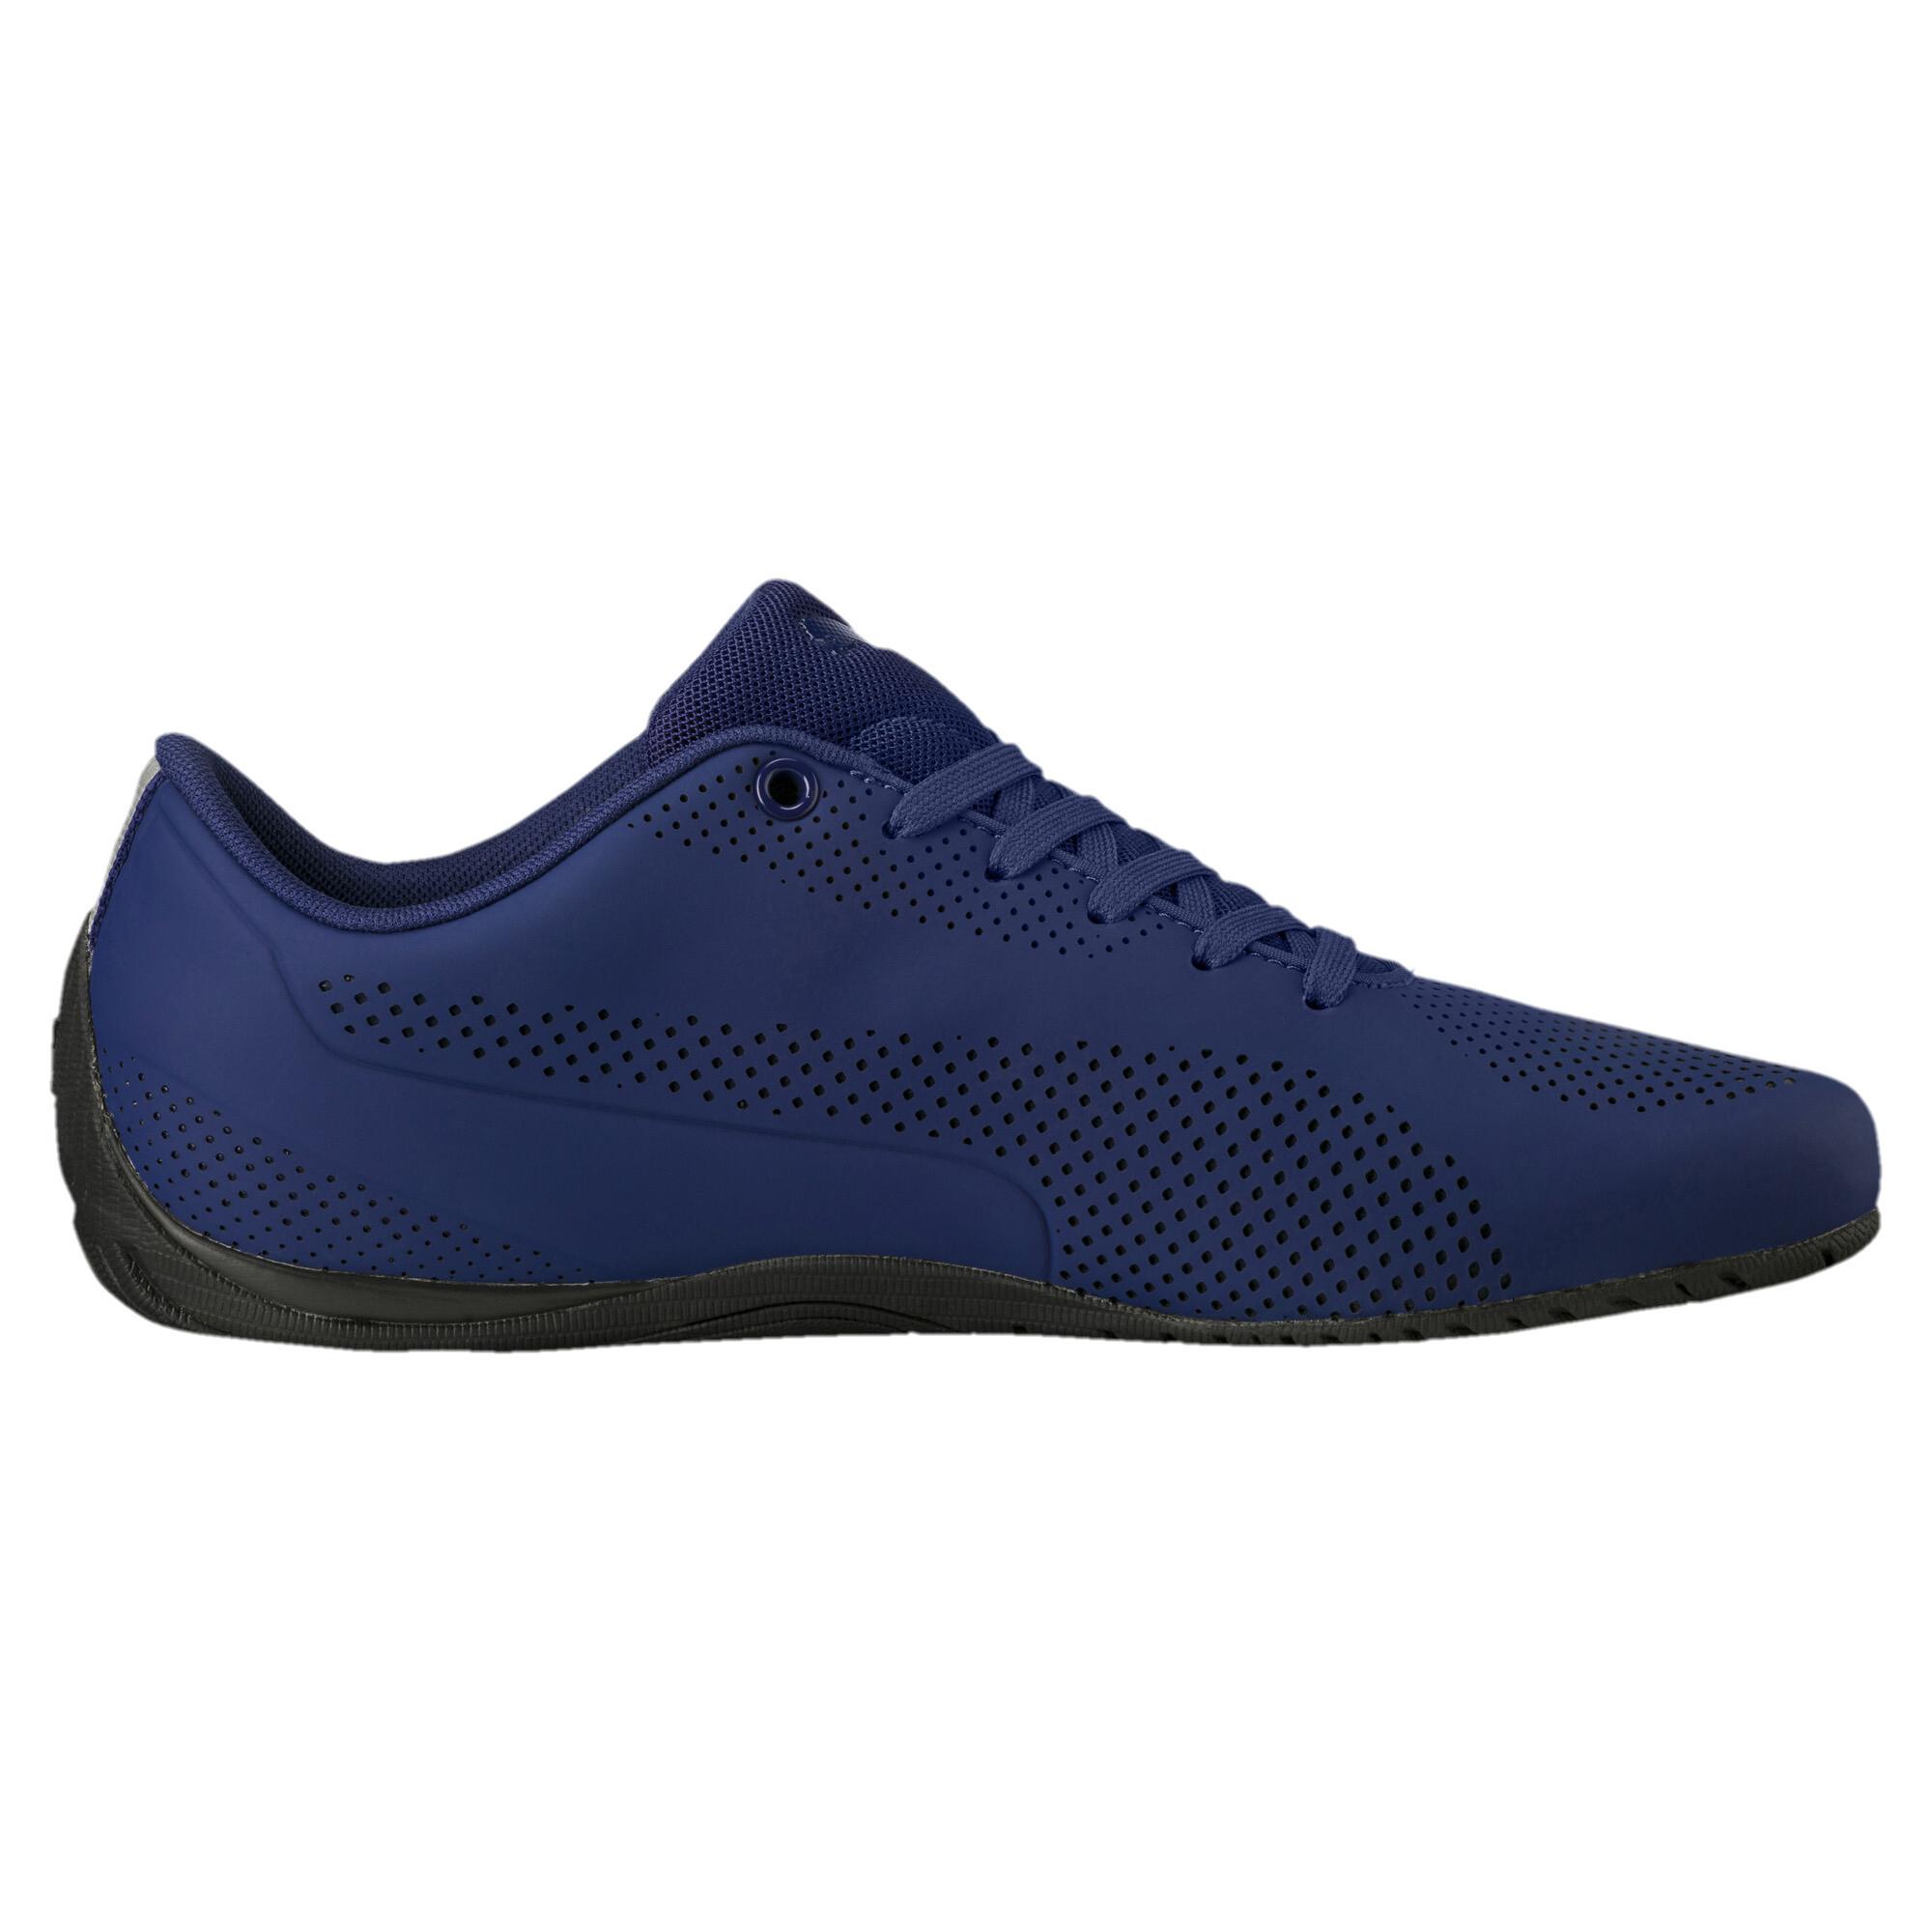 PUMA-Men-039-s-Drift-Cat-Ultra-Reflective-Shoes thumbnail 10